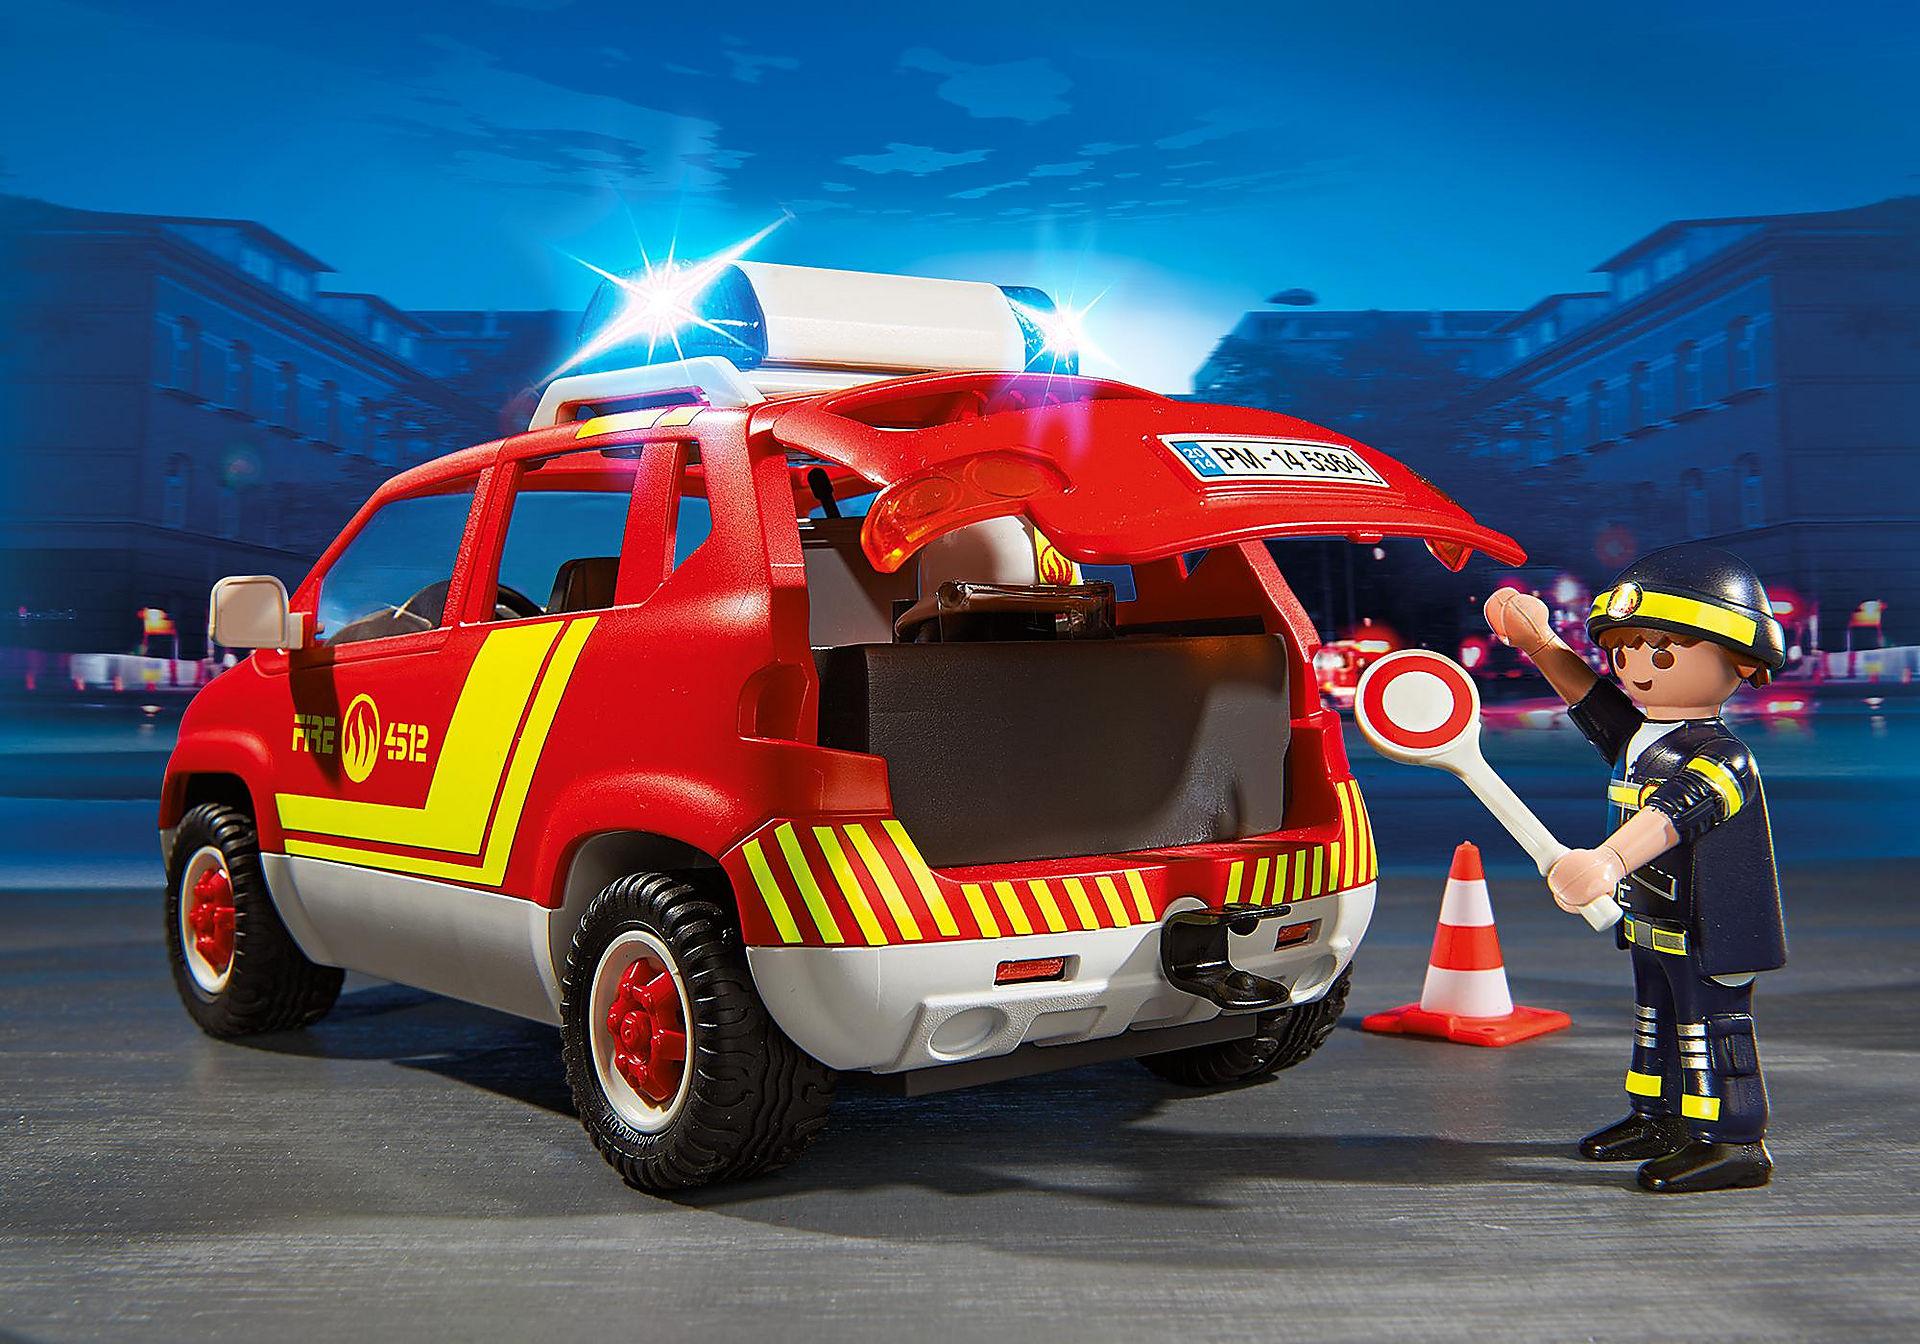 http://media.playmobil.com/i/playmobil/5364_product_extra2/Auto del caposquadra dei Vigili del fuoco